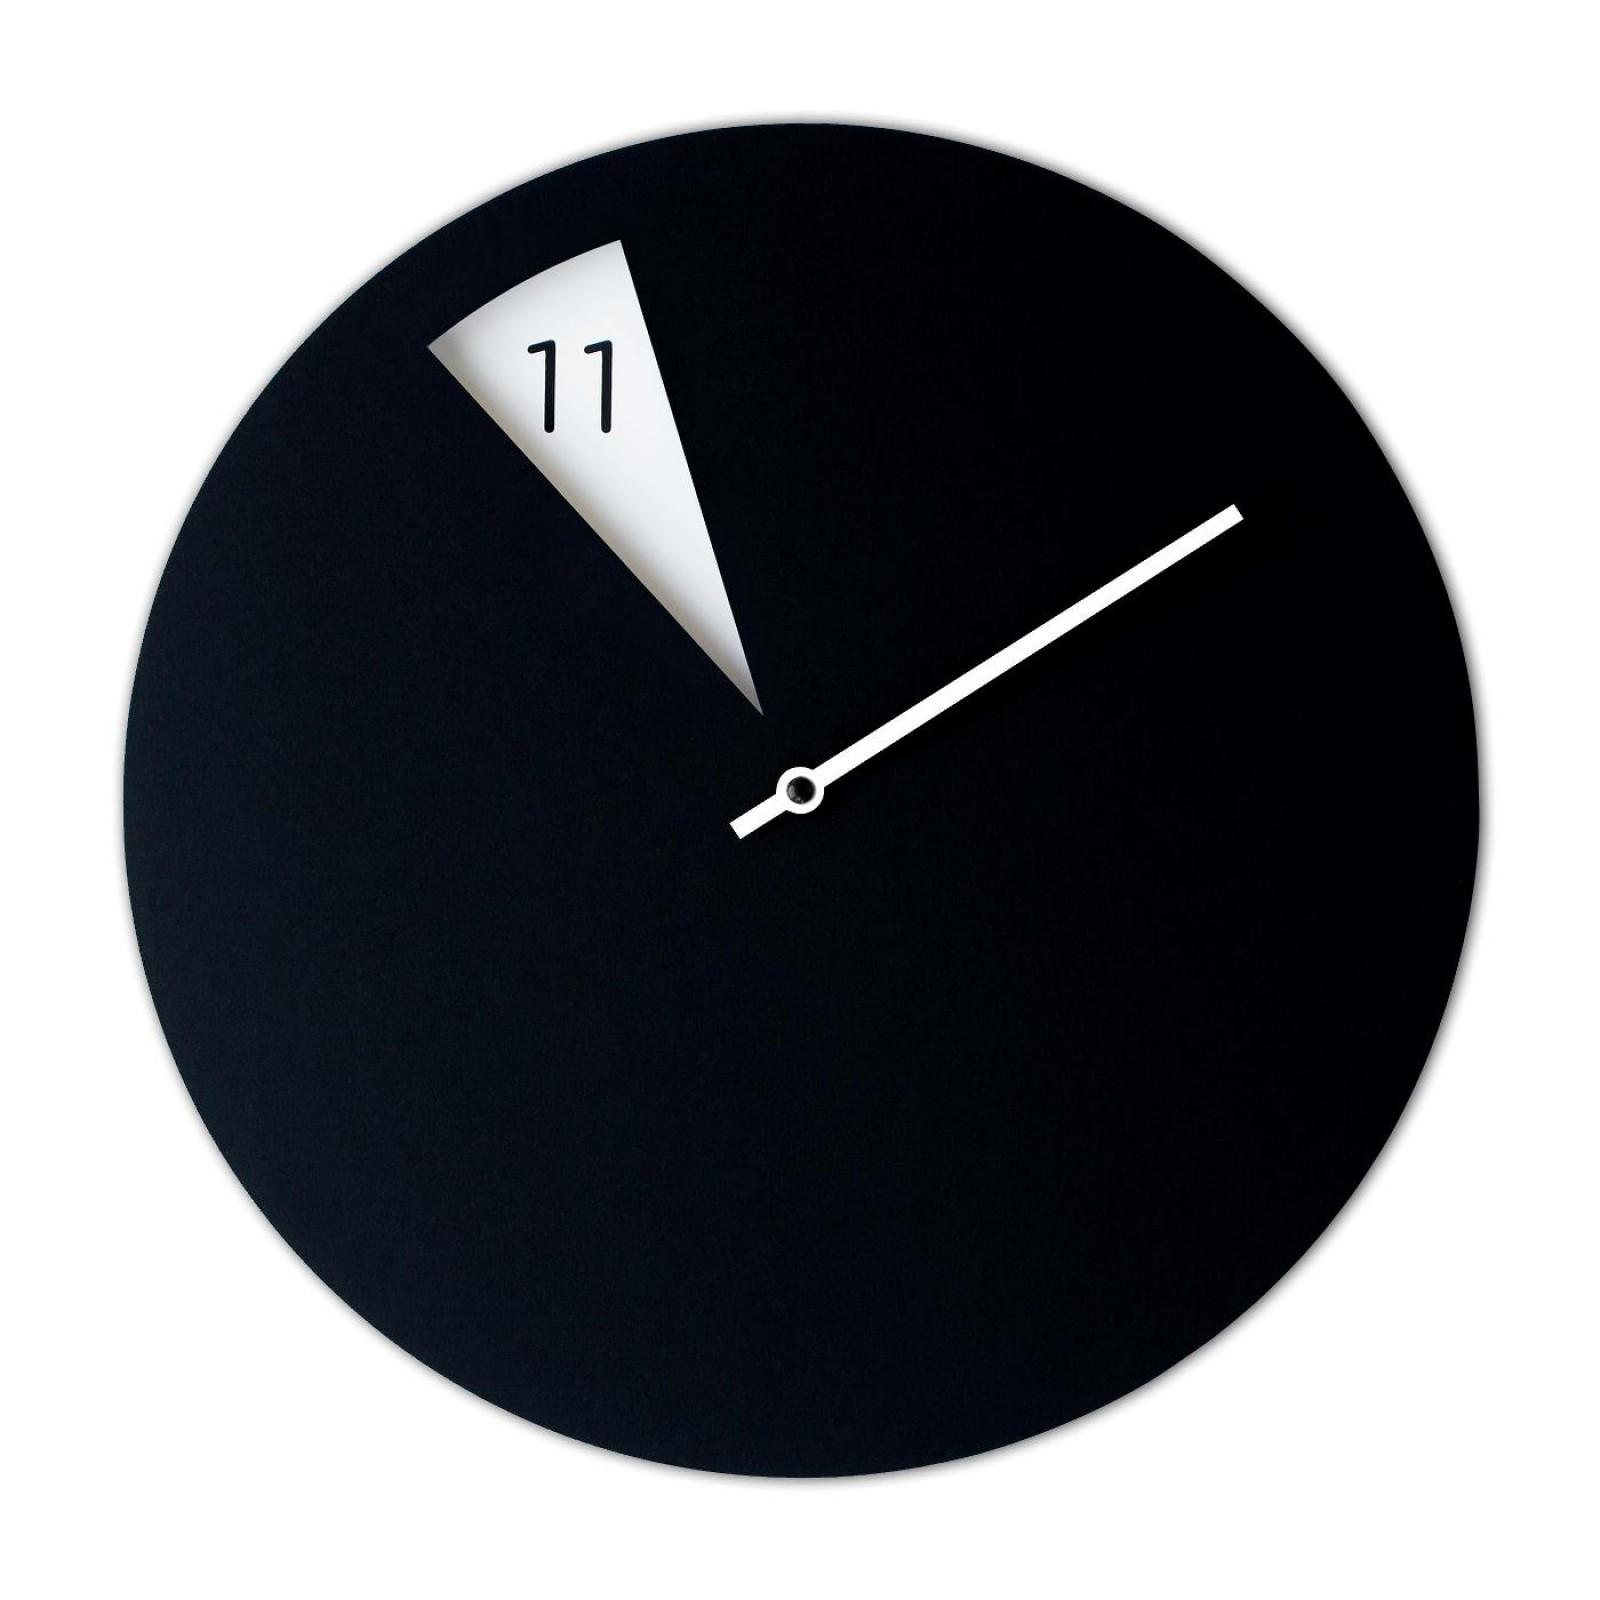 Freakish Wall Clock (Black / White) – Sabrina Fossi Design